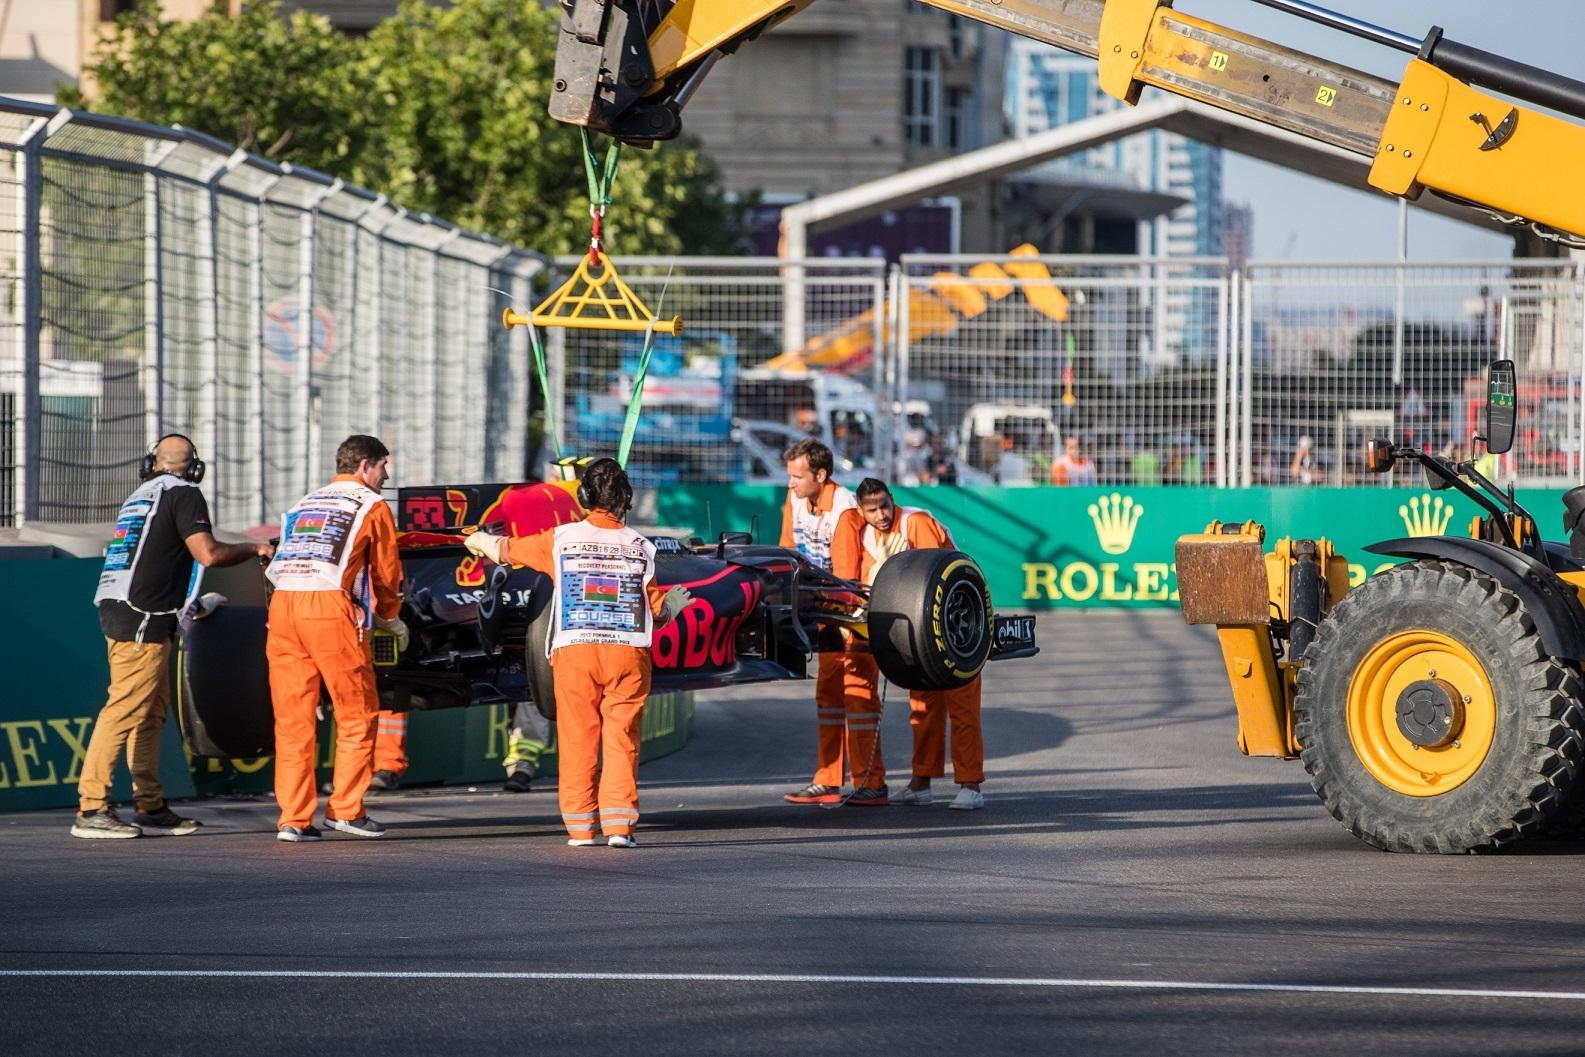 Началась регистрация маршалов на 2018 Гран-При Азербайджана Формулы 1 (ФОТО)